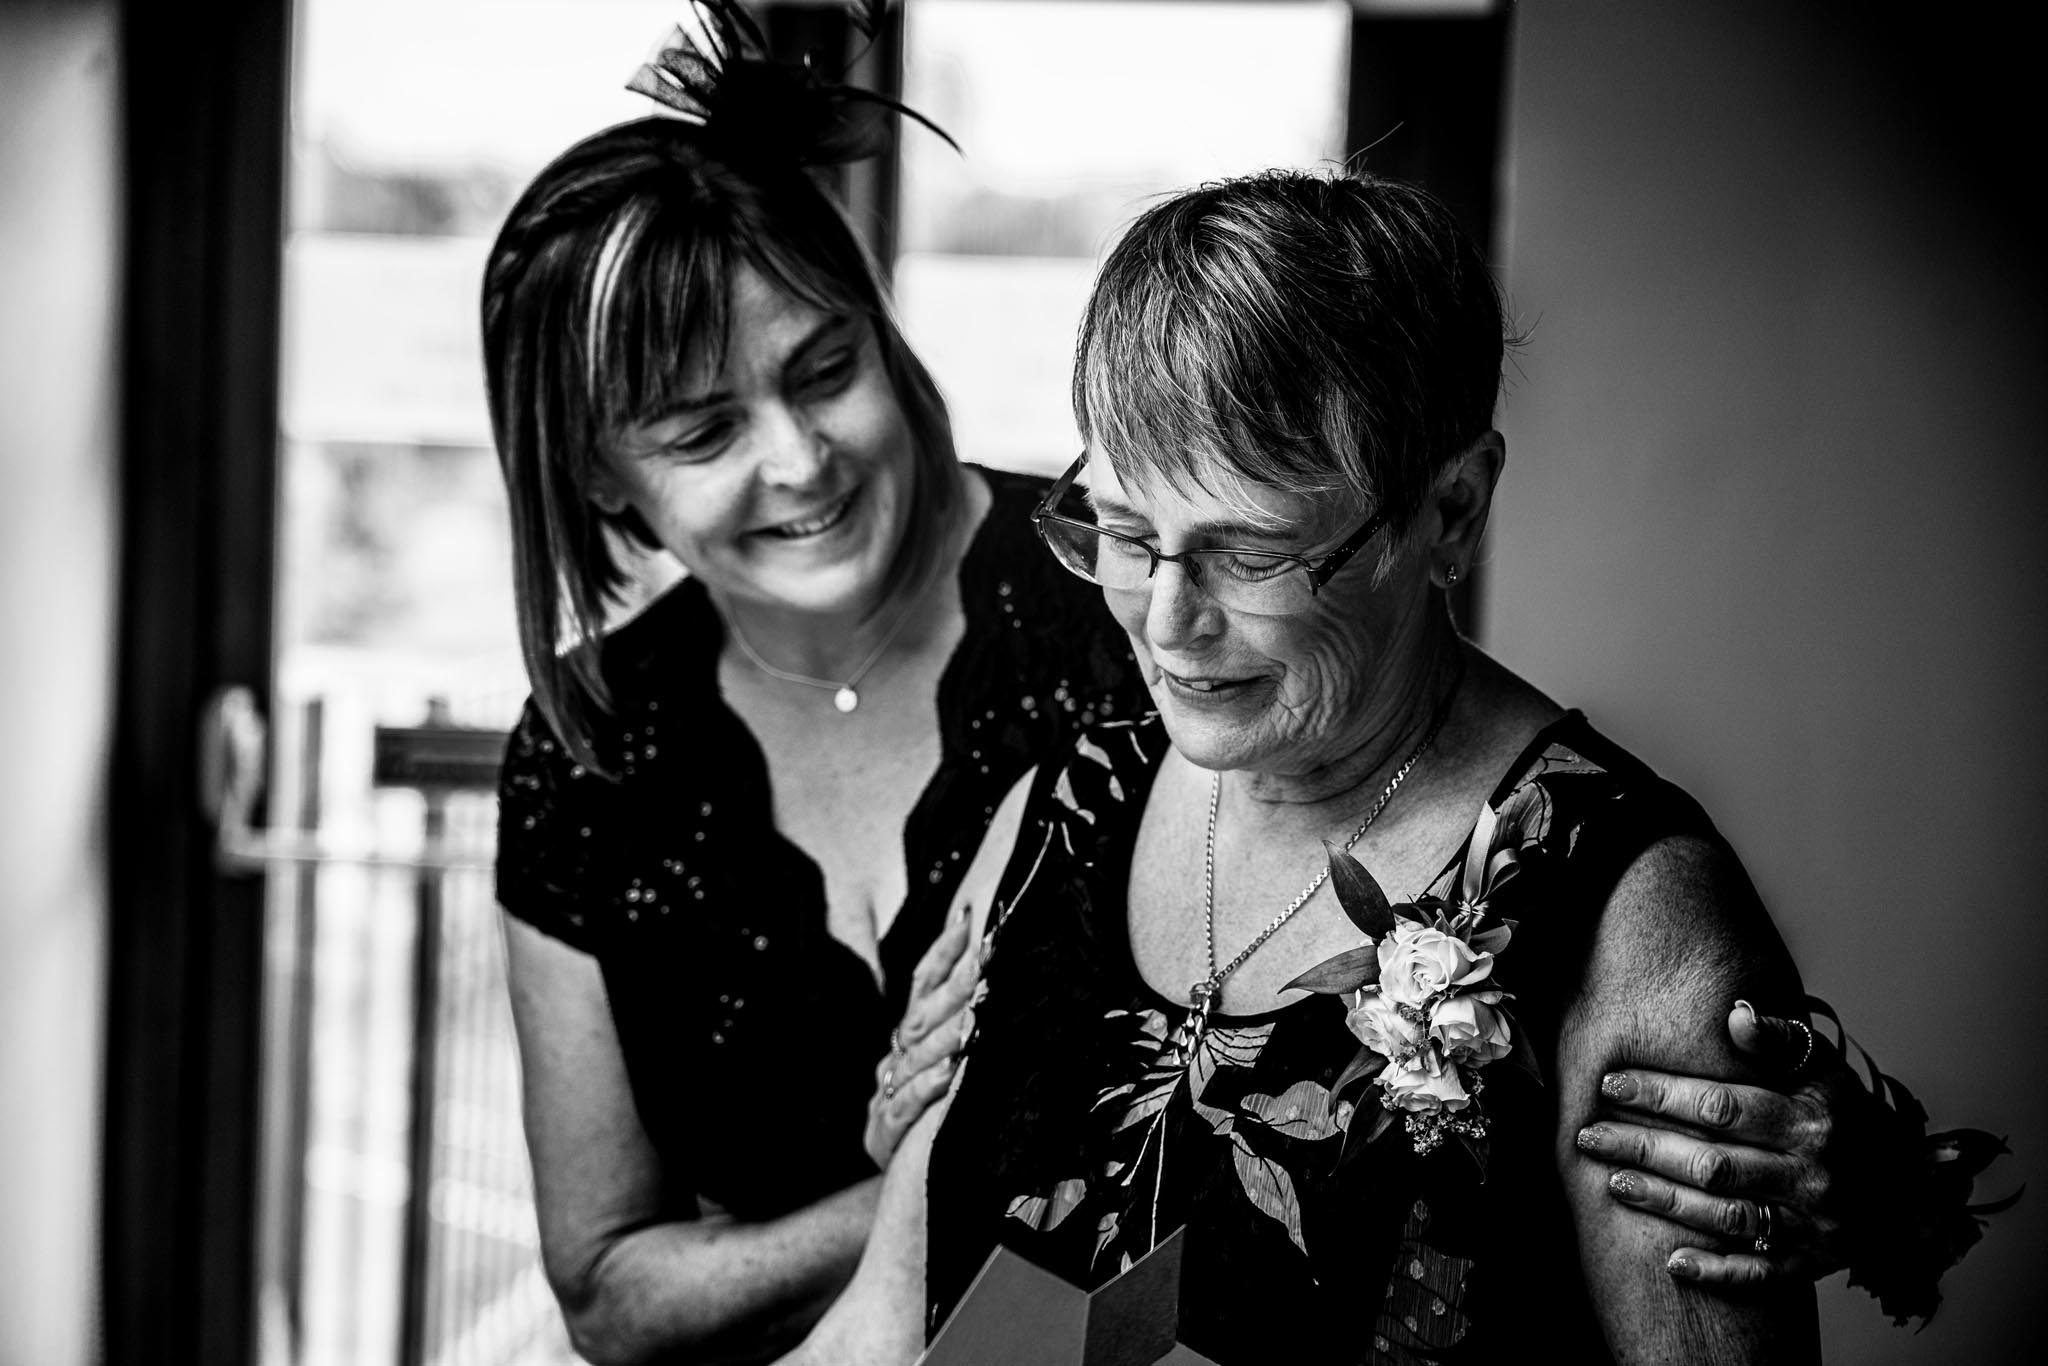 377-Ceremony-Luke-Yasmin-The-Rayleigh-Club-Wedding-Photography.jpg